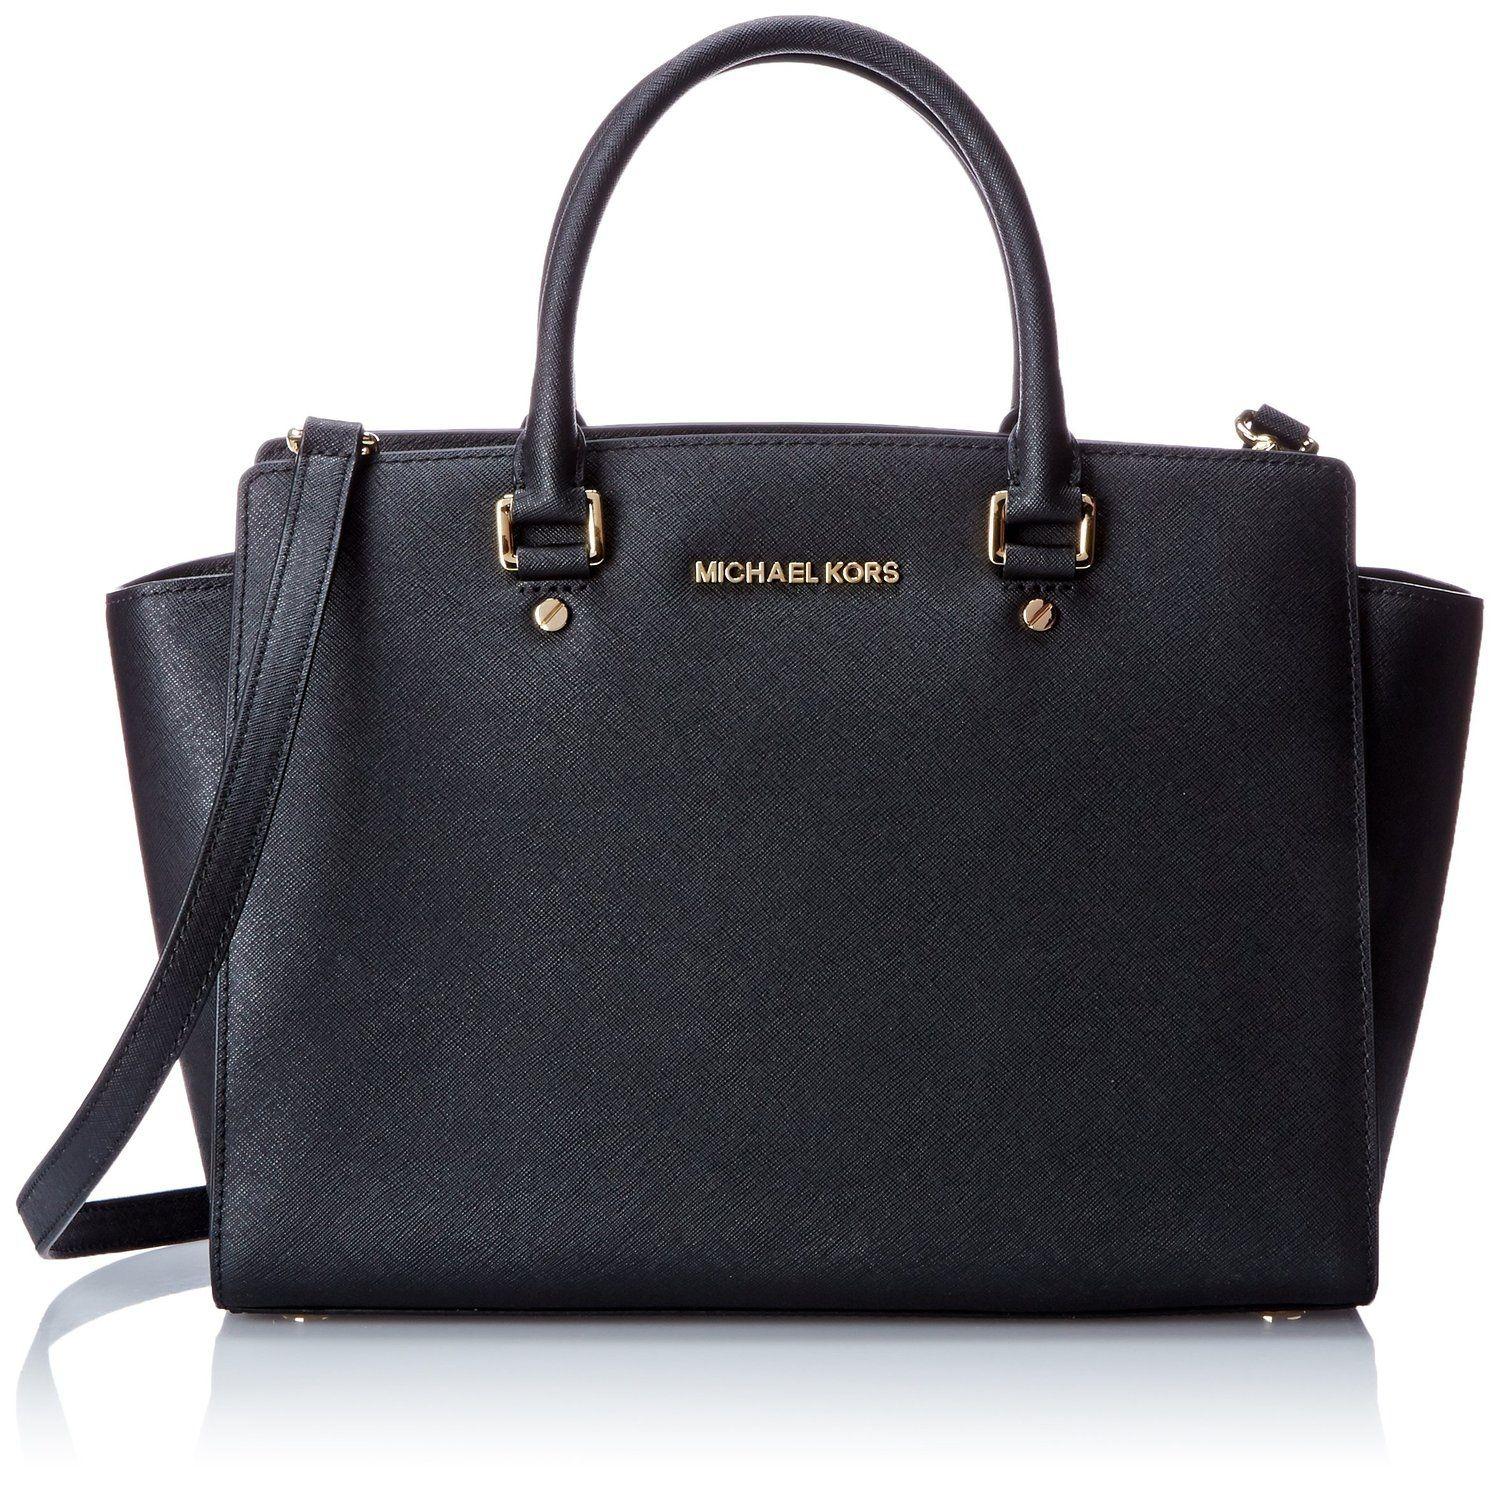 Michael Kors Handbag Selma Large Top Zip East West Satchel